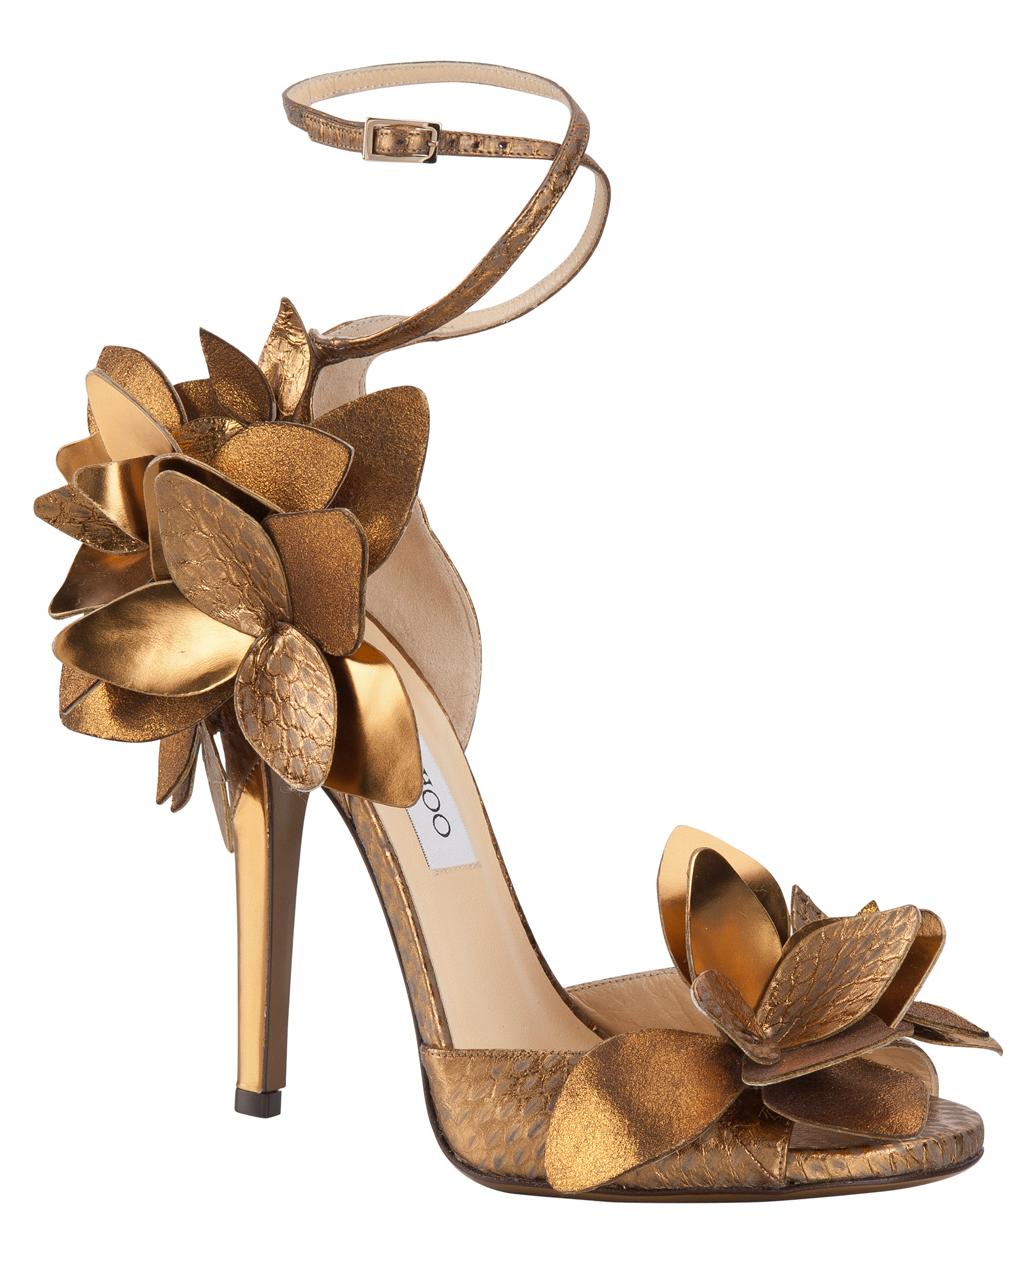 jimmy-choo-shoes-msw-fall13.jpg